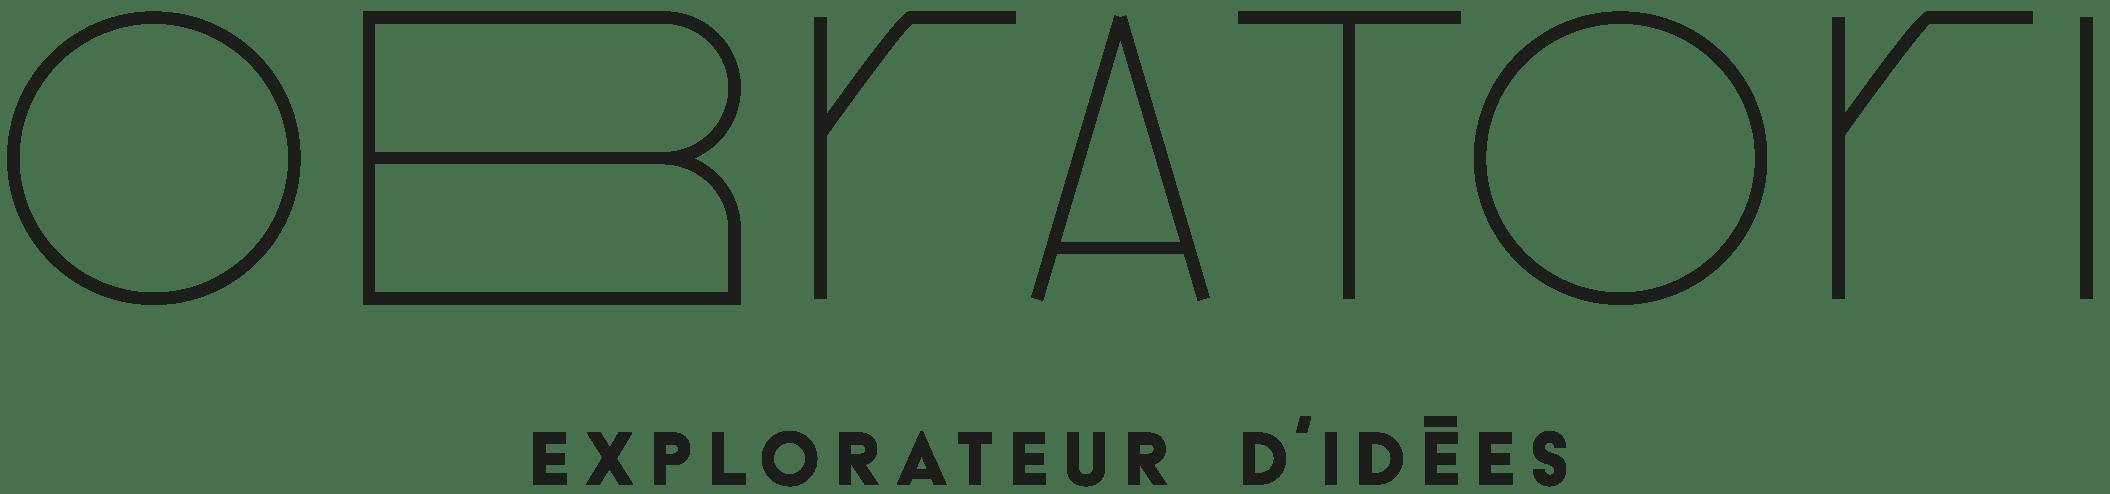 Logo Obratori